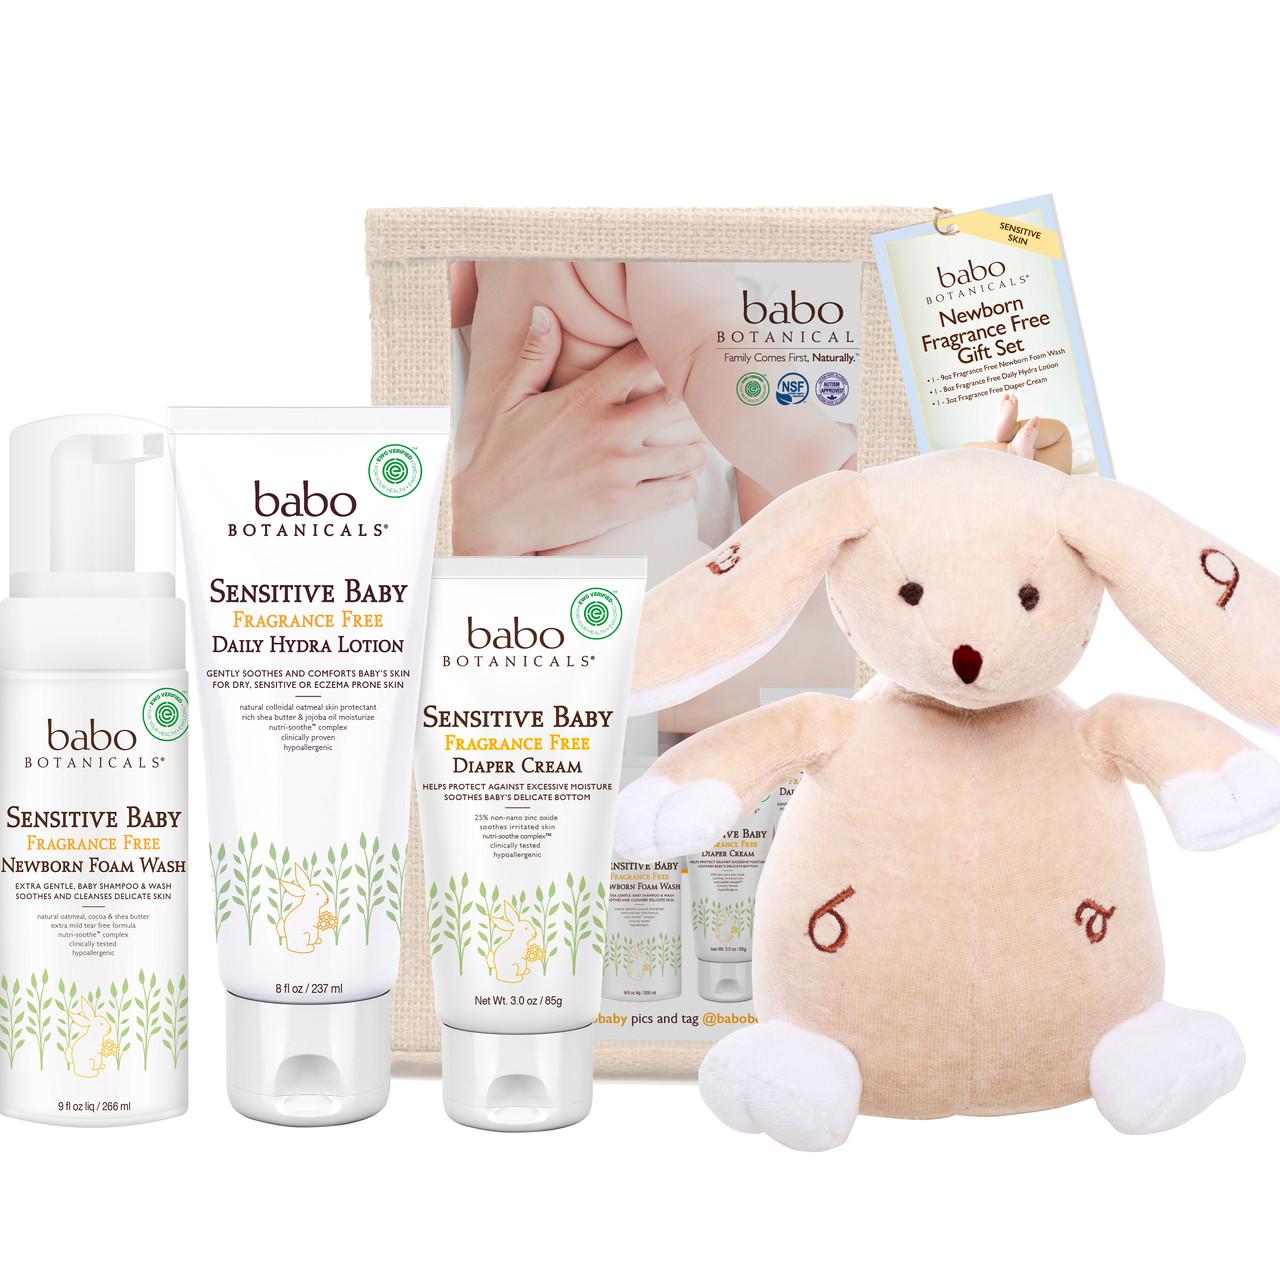 2018 Sensitive Baby Gift Set Bunny_RGB